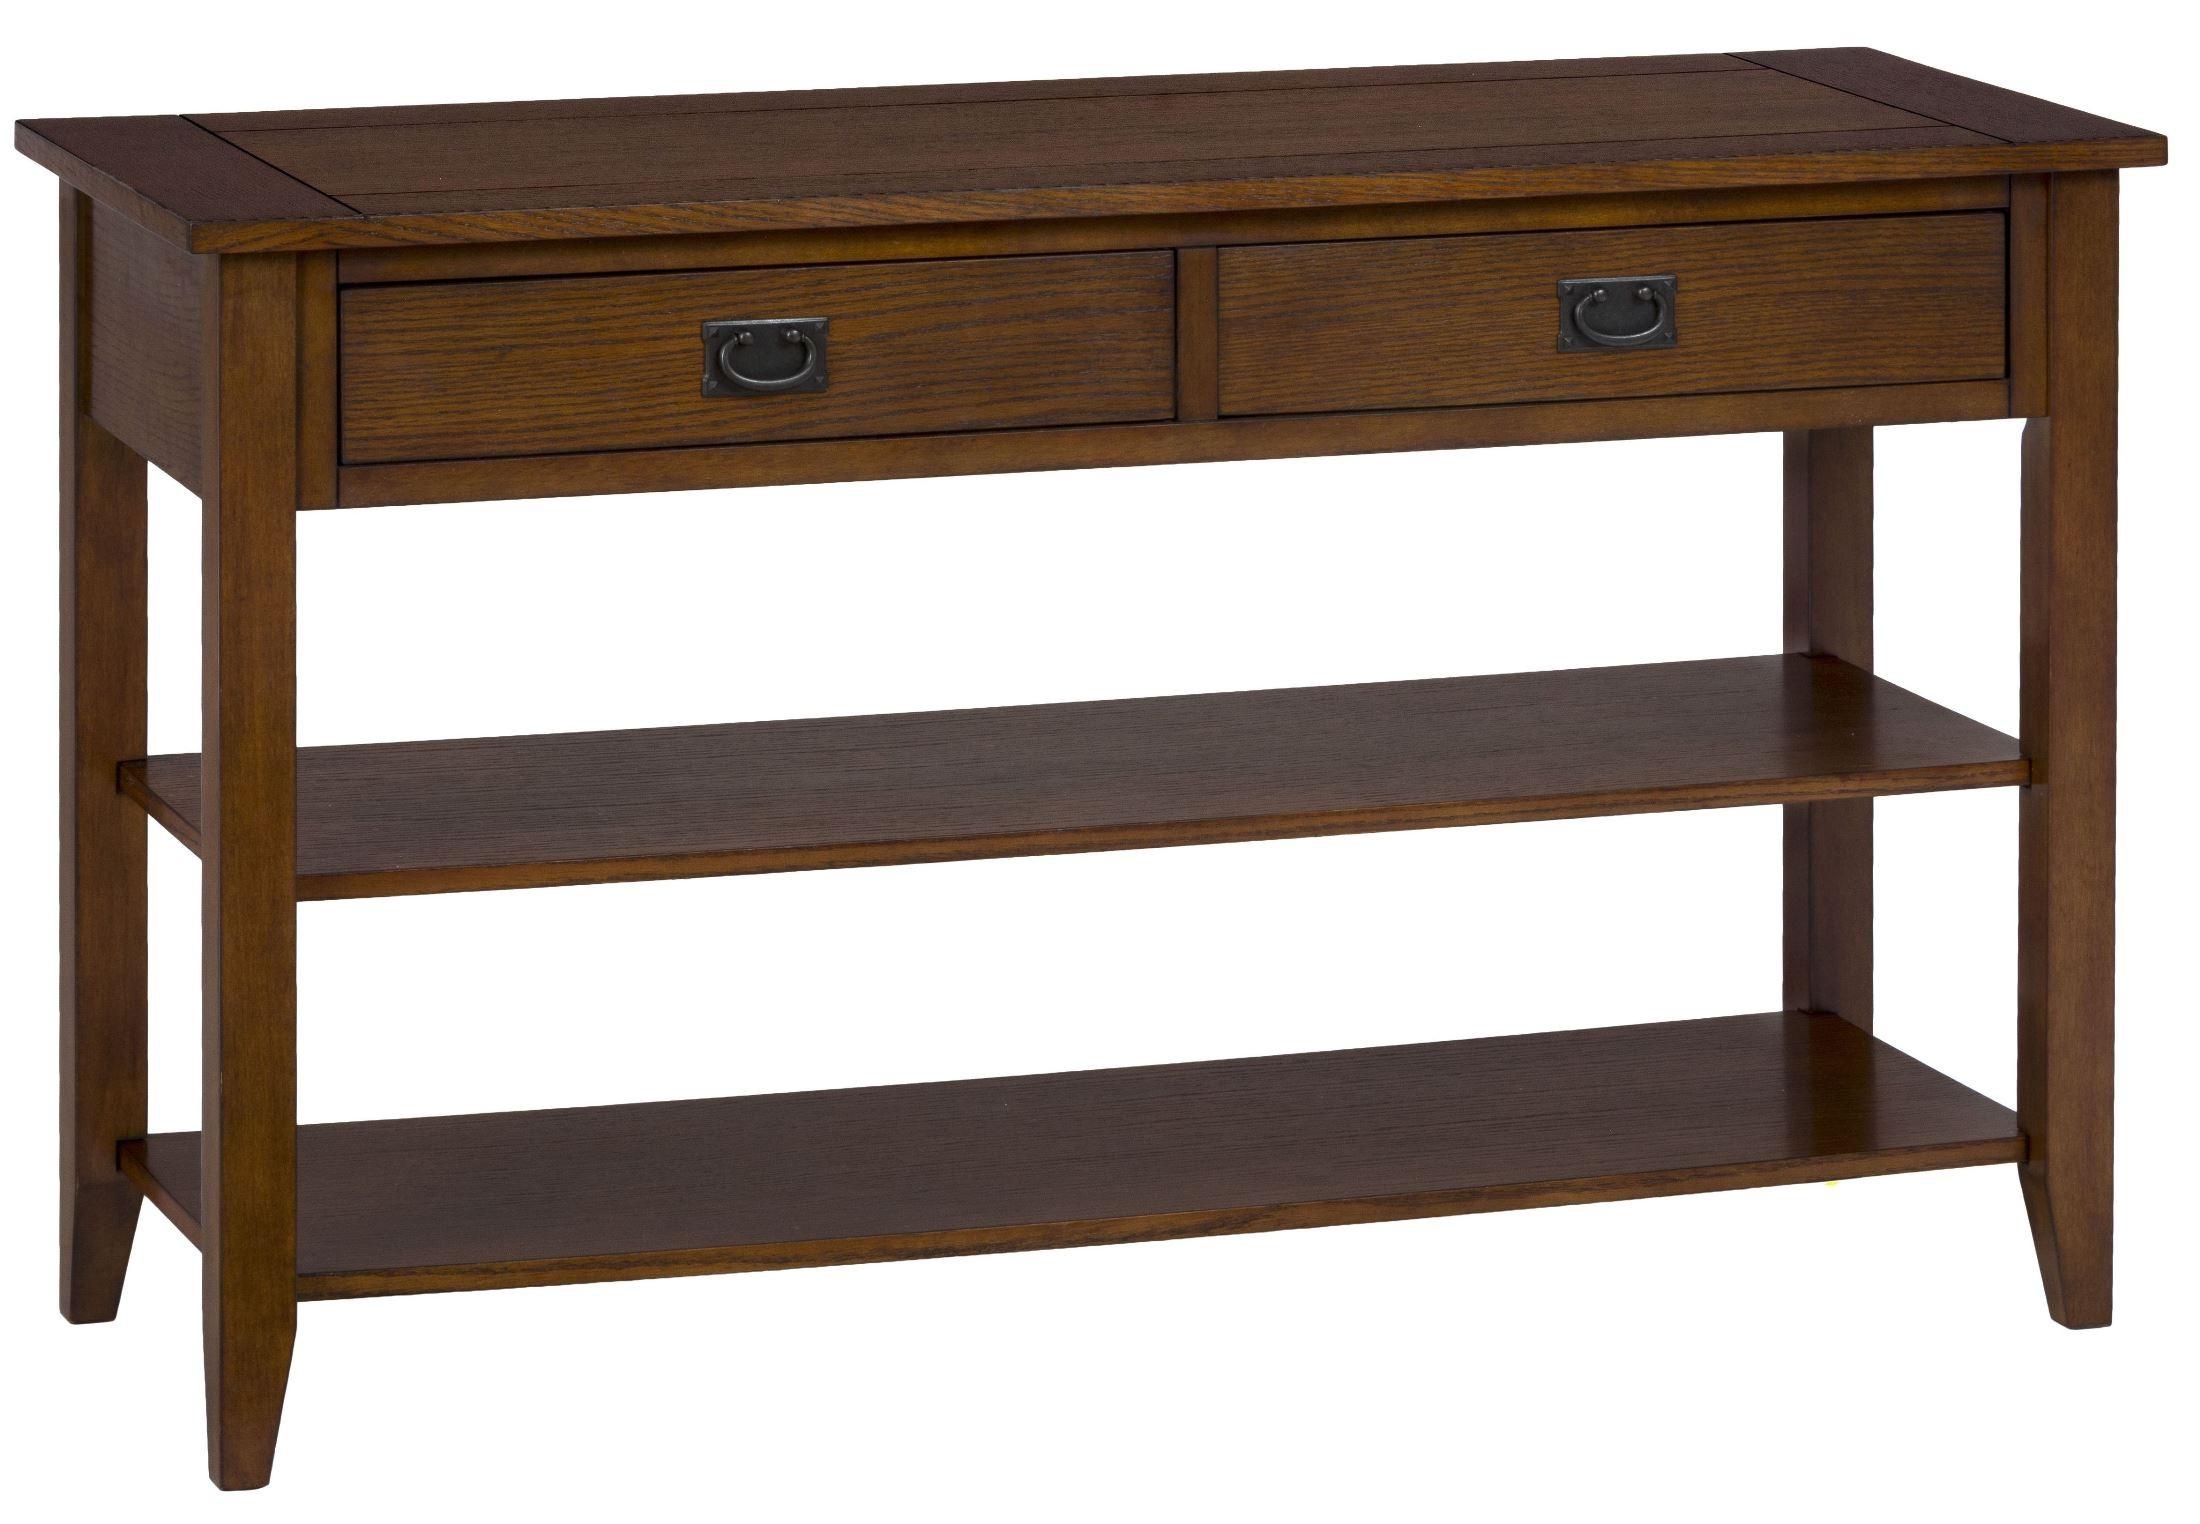 Mission oak sofa table 1032 4 jofran for 5 sofa table